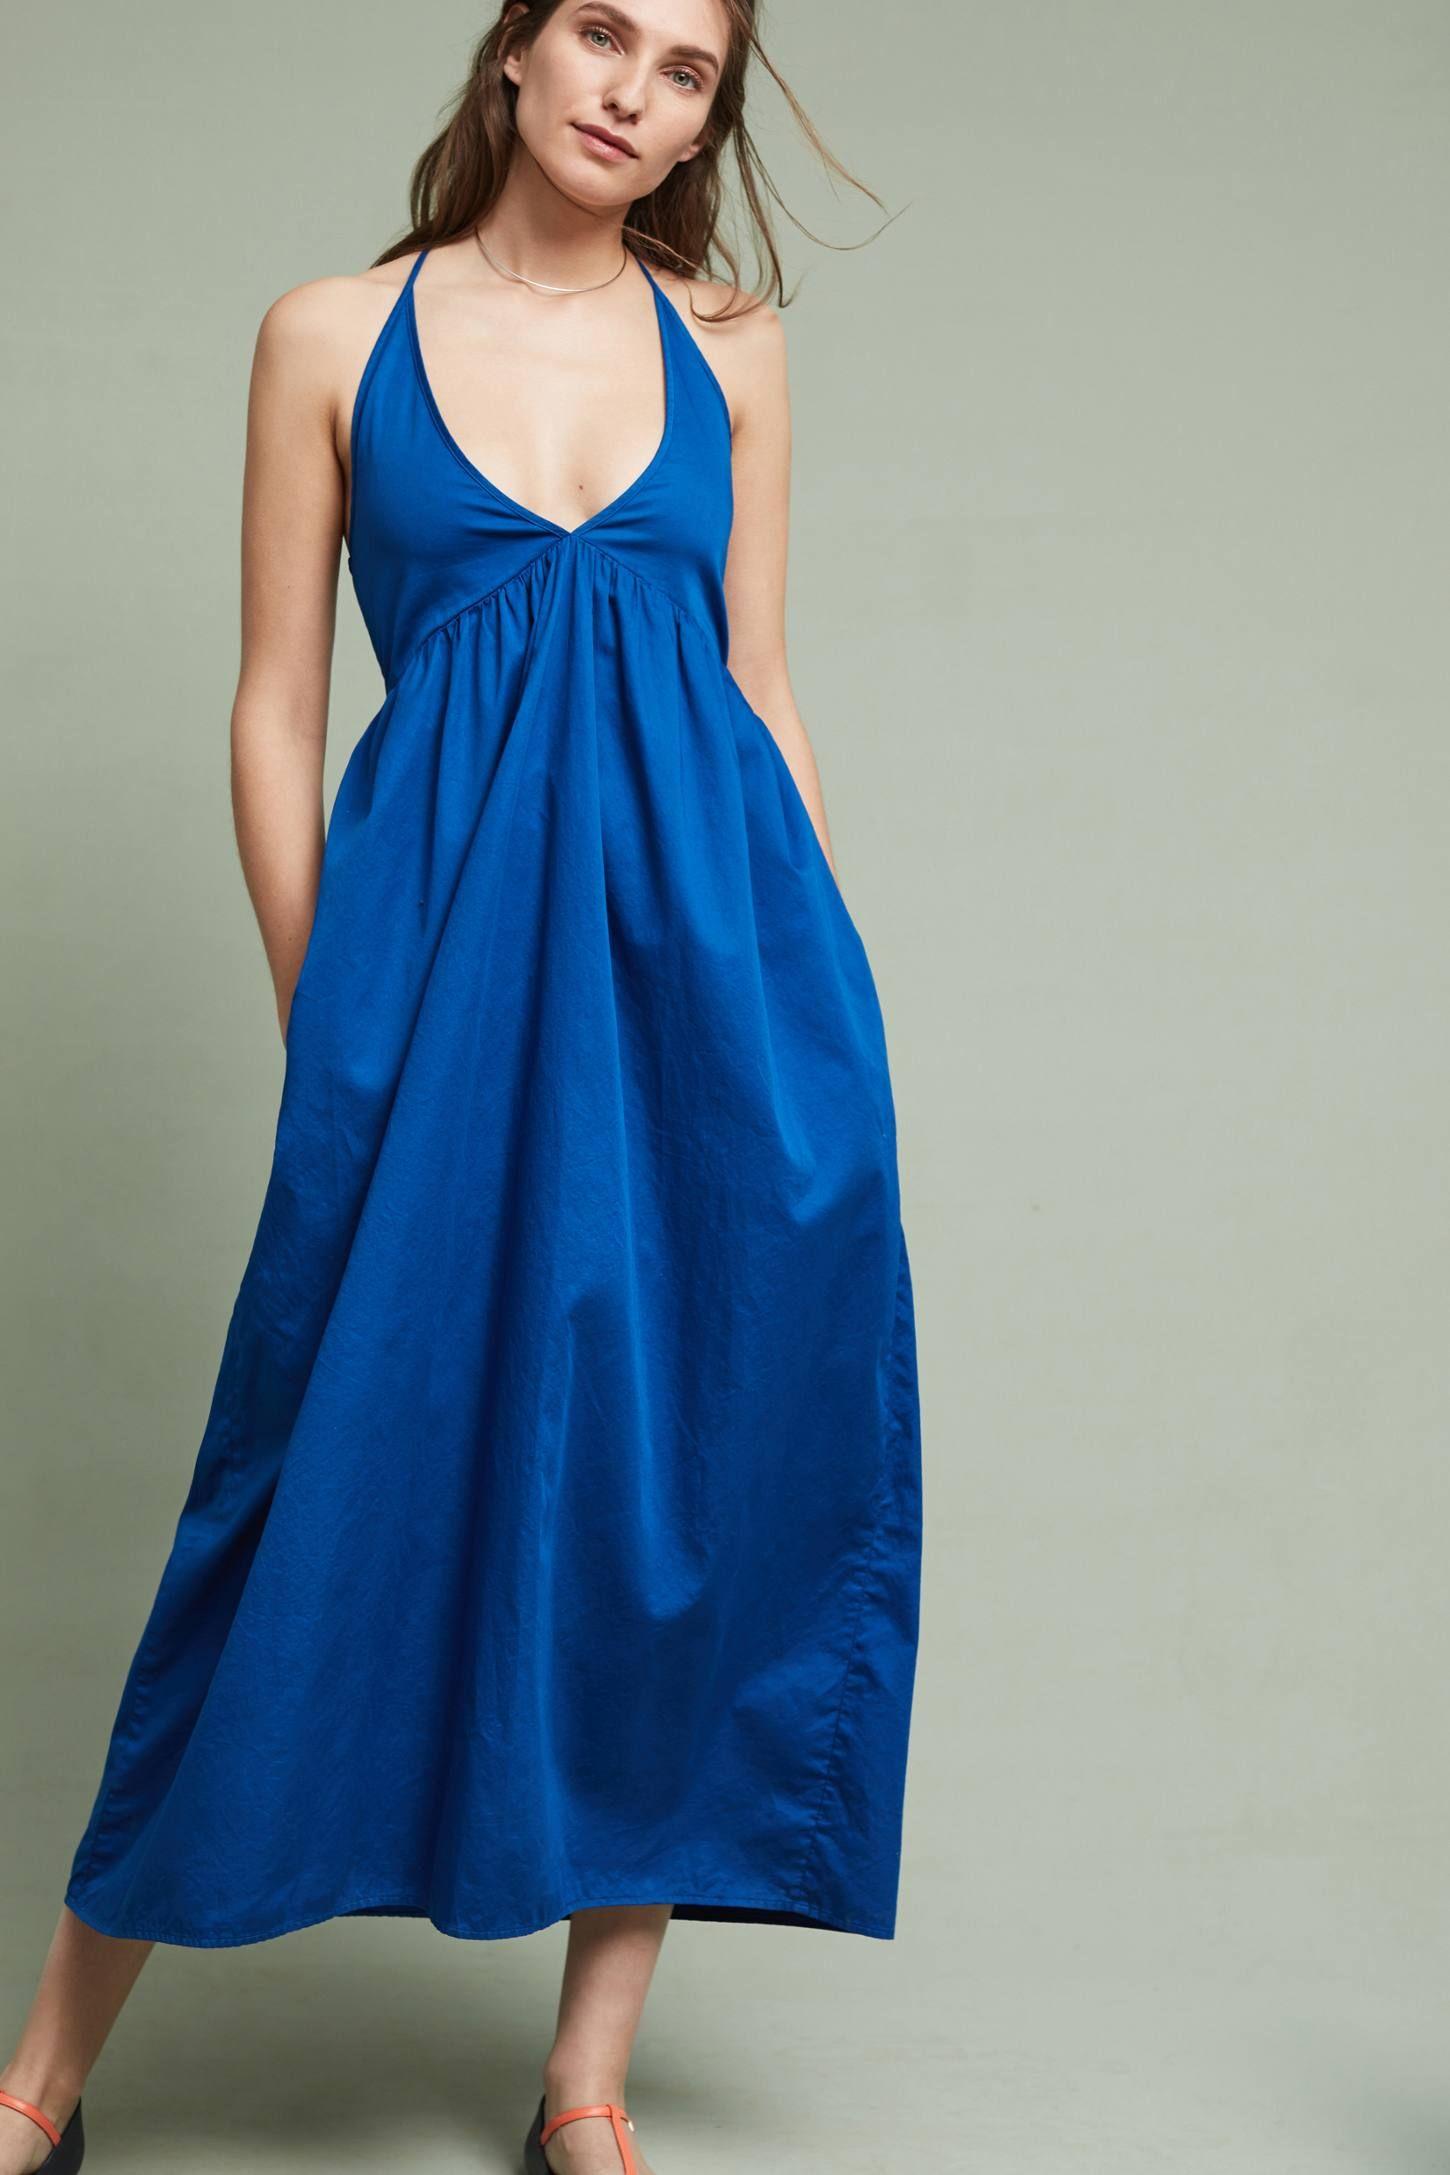 86025f843eb0 Audra Dress | Wedding Guest | Semi-Formal | Dresses, Fashion, Clothes